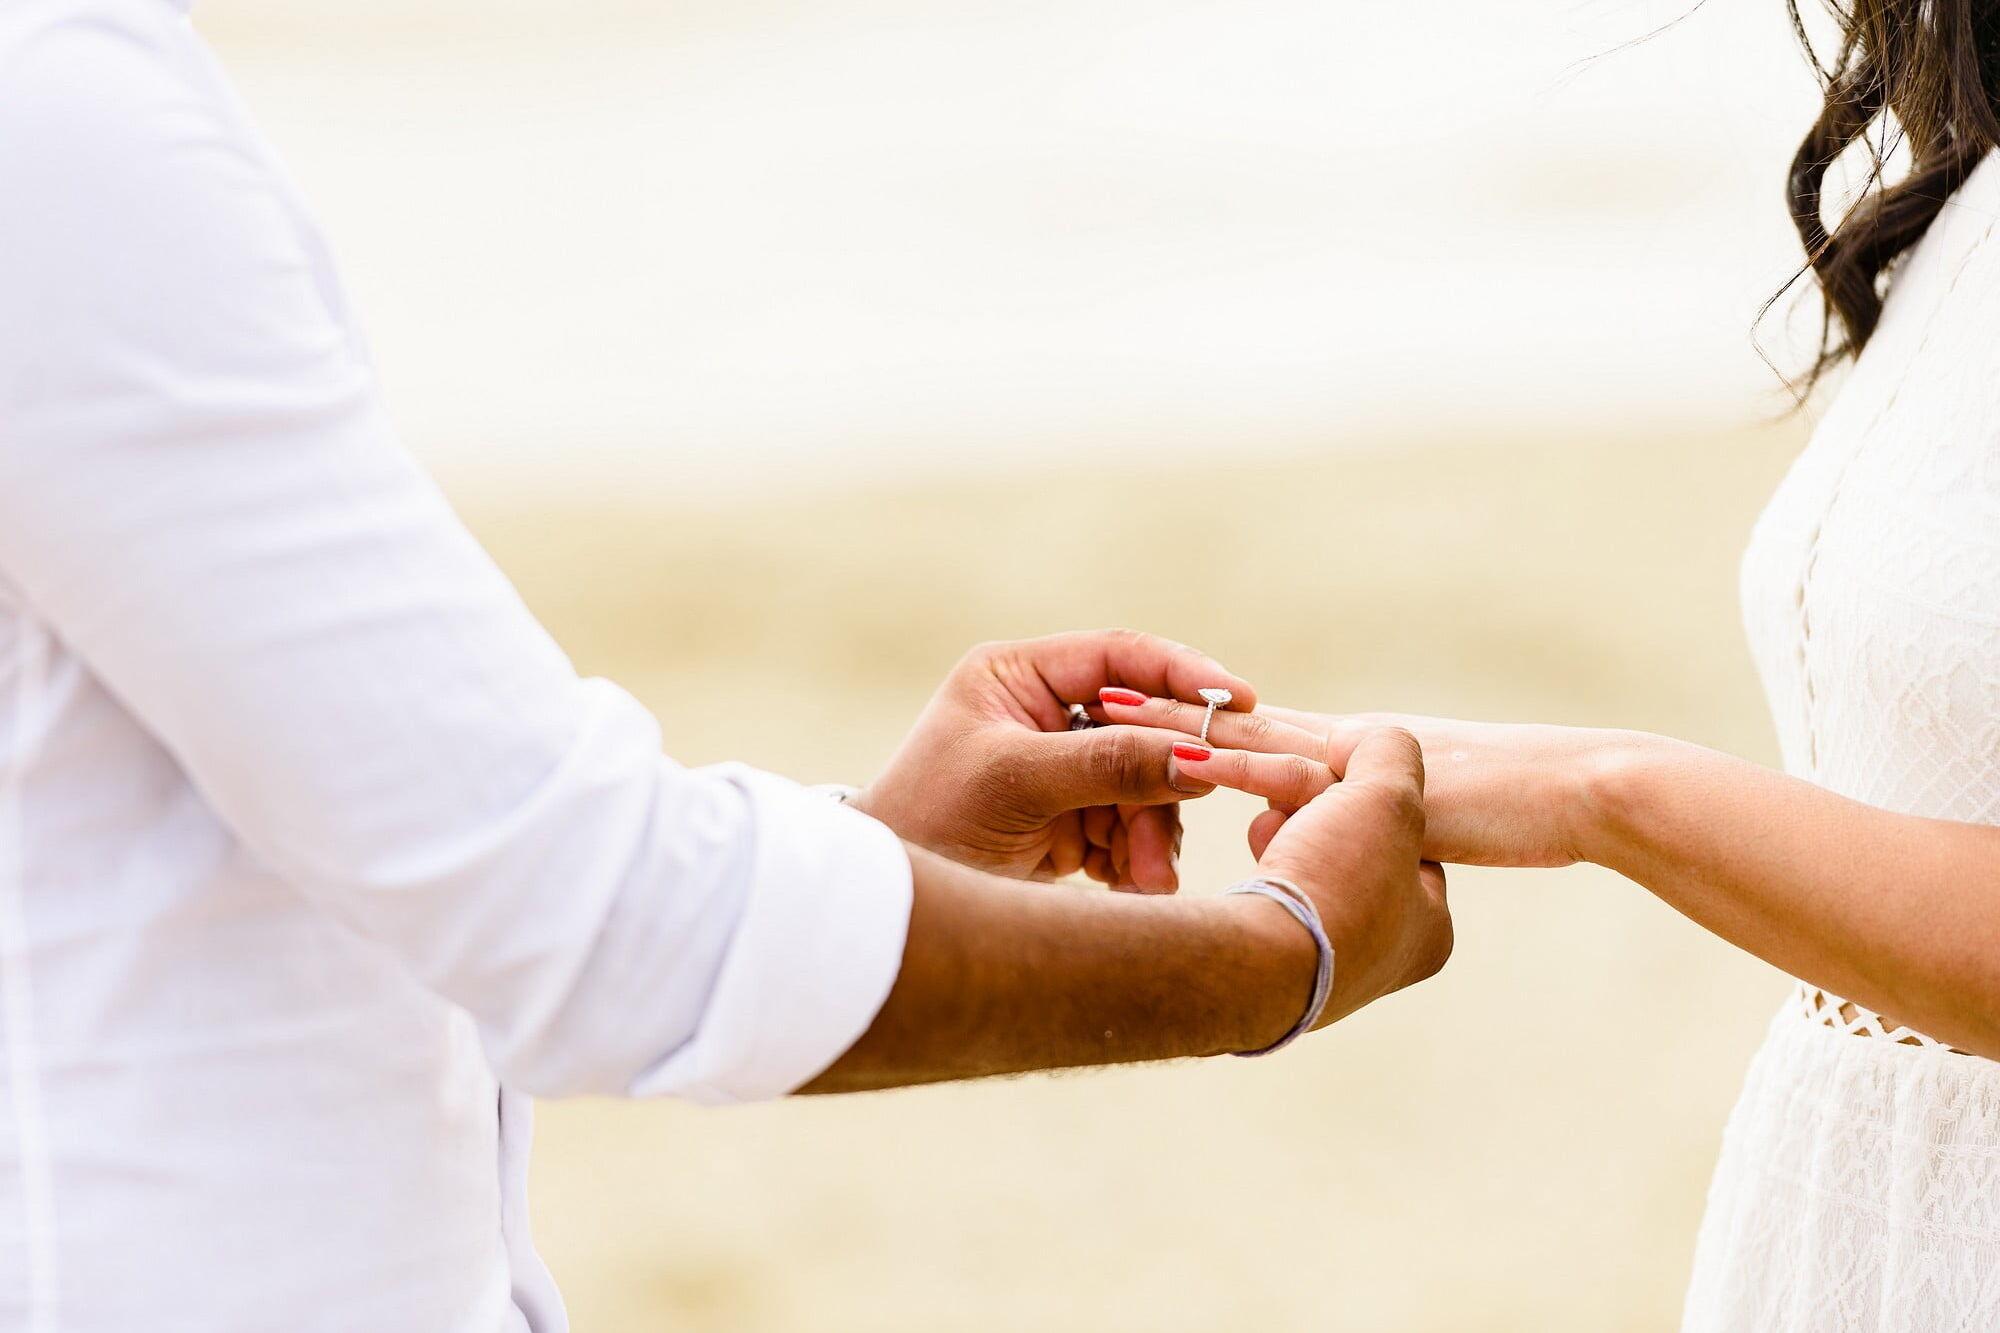 st-michaels-mount-wedding-proposal-12